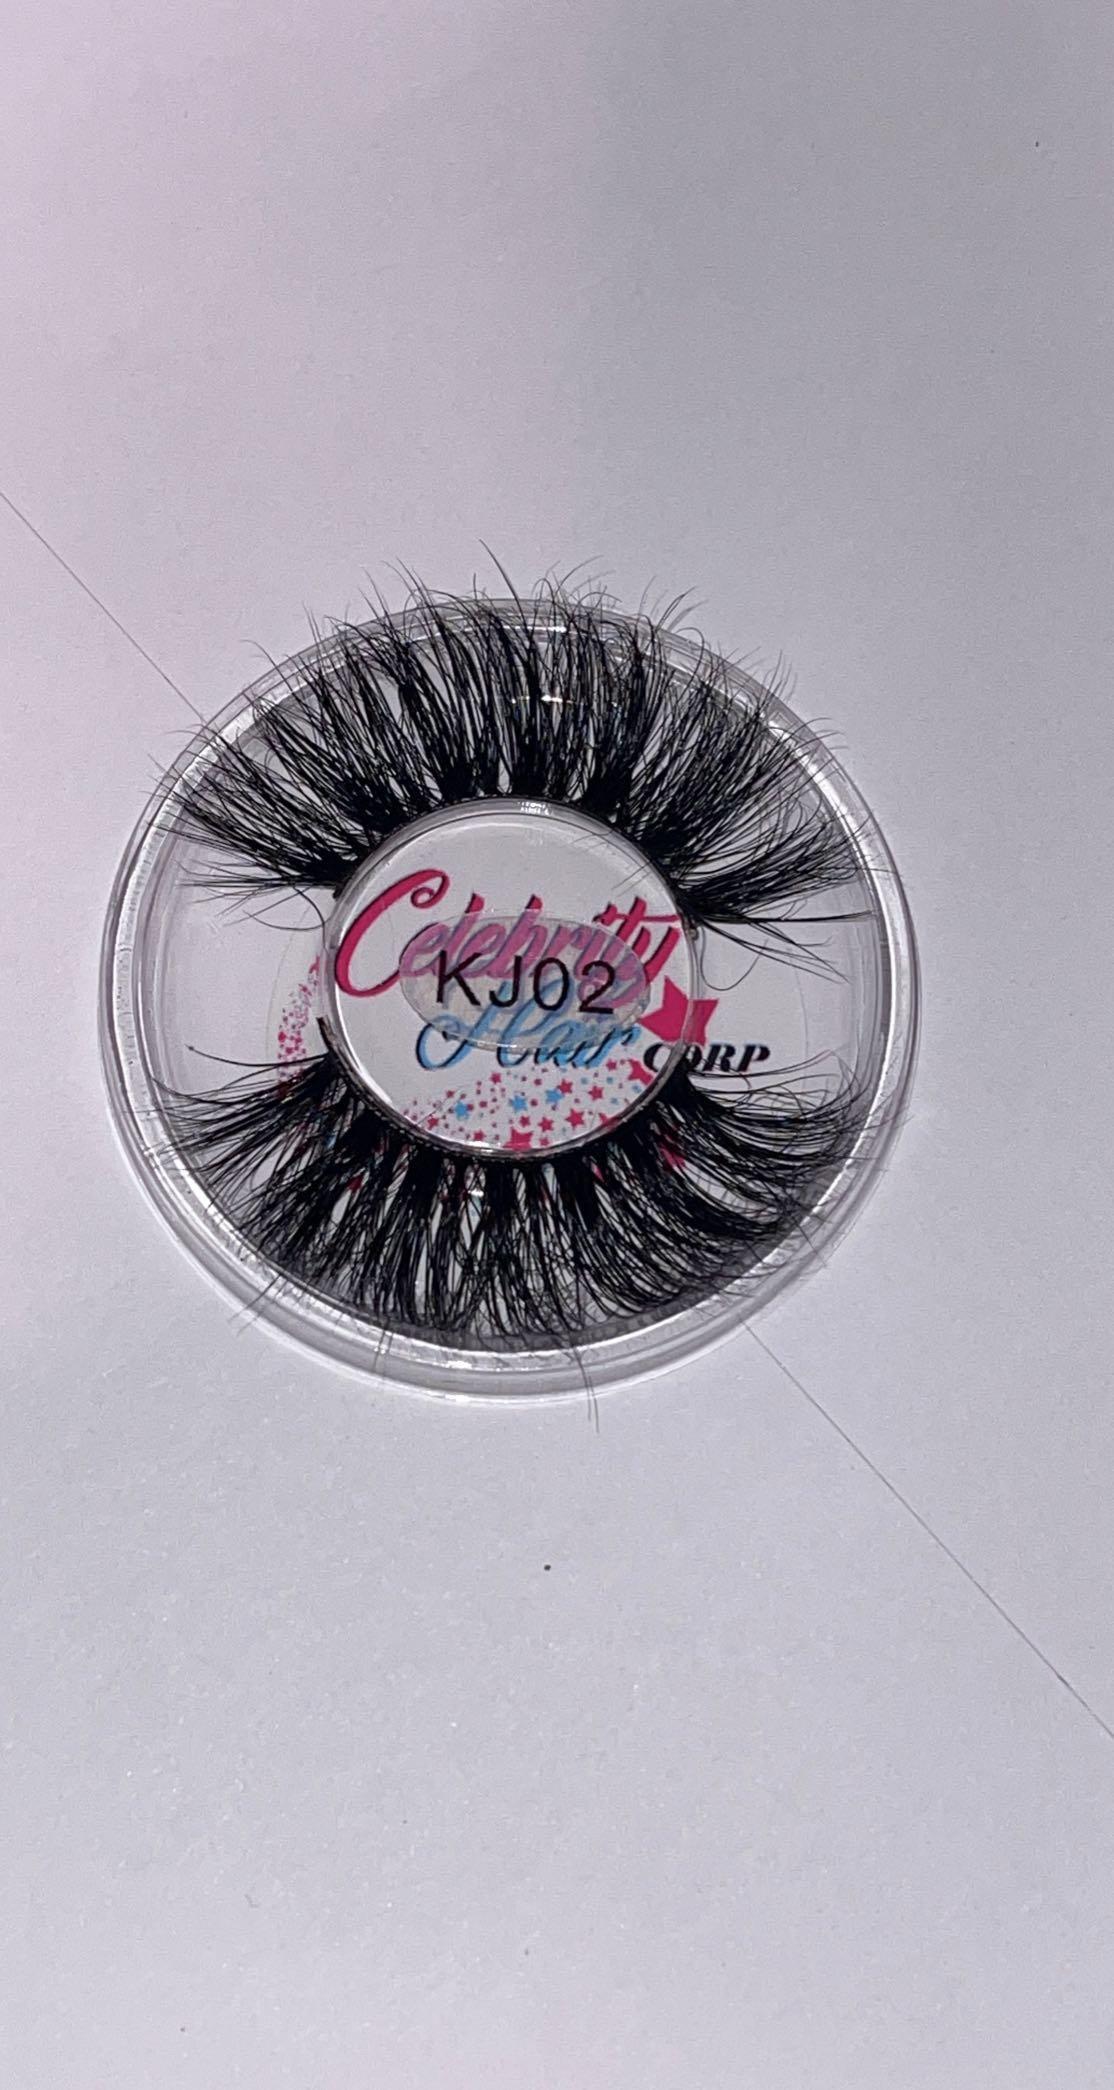 3D Real Mink Eyelashes - 22-25mm